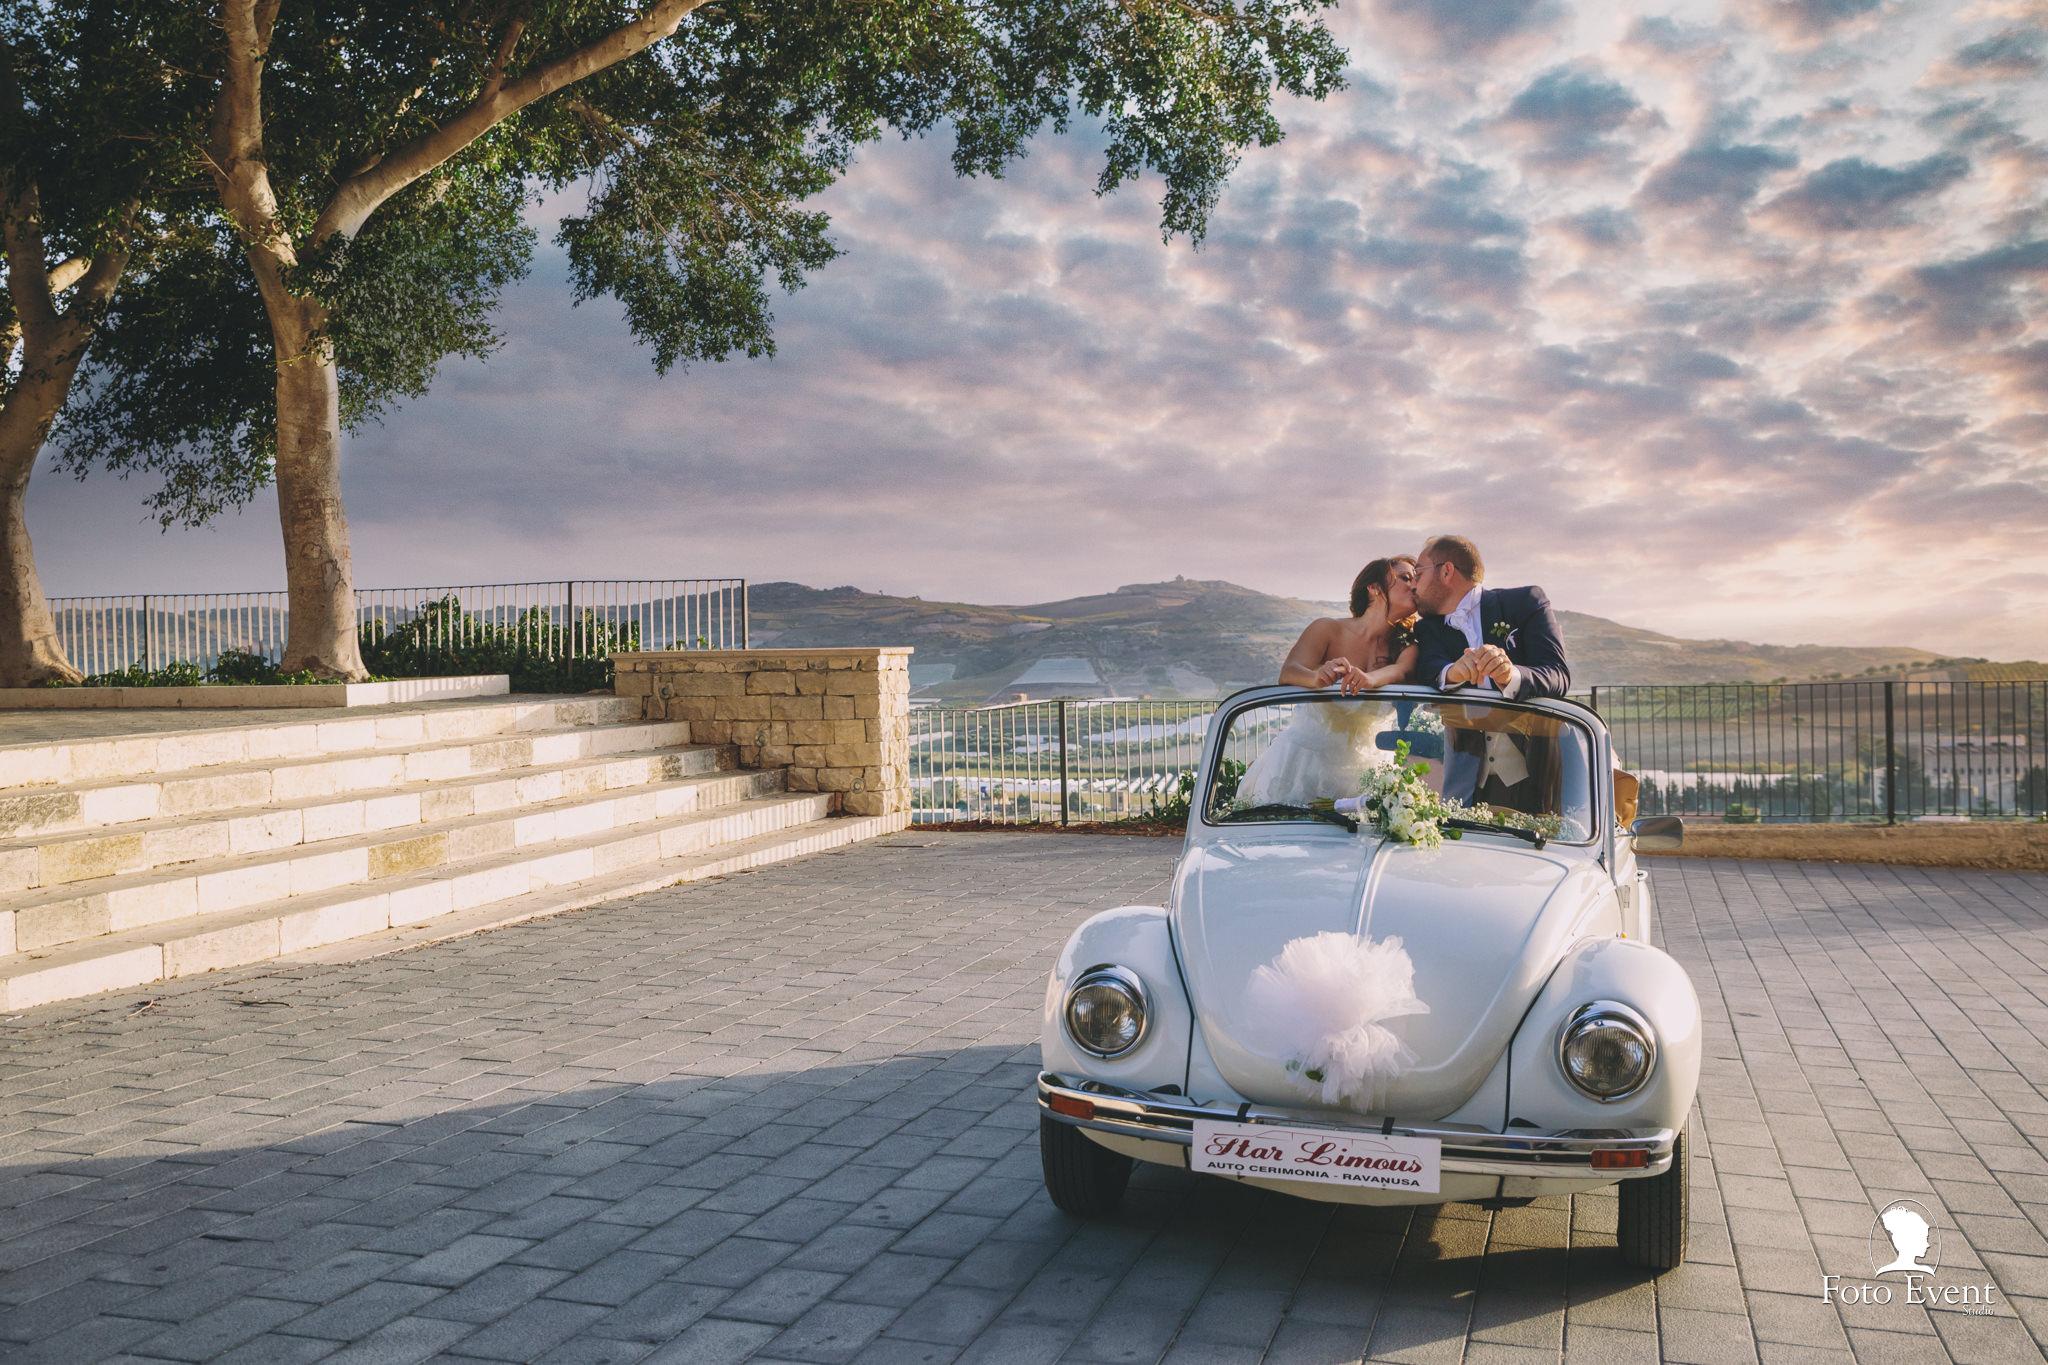 043-2020-10-15-Matrimonio-Noemi-e-Salvatore-Paterno-5DE-1752-Edit